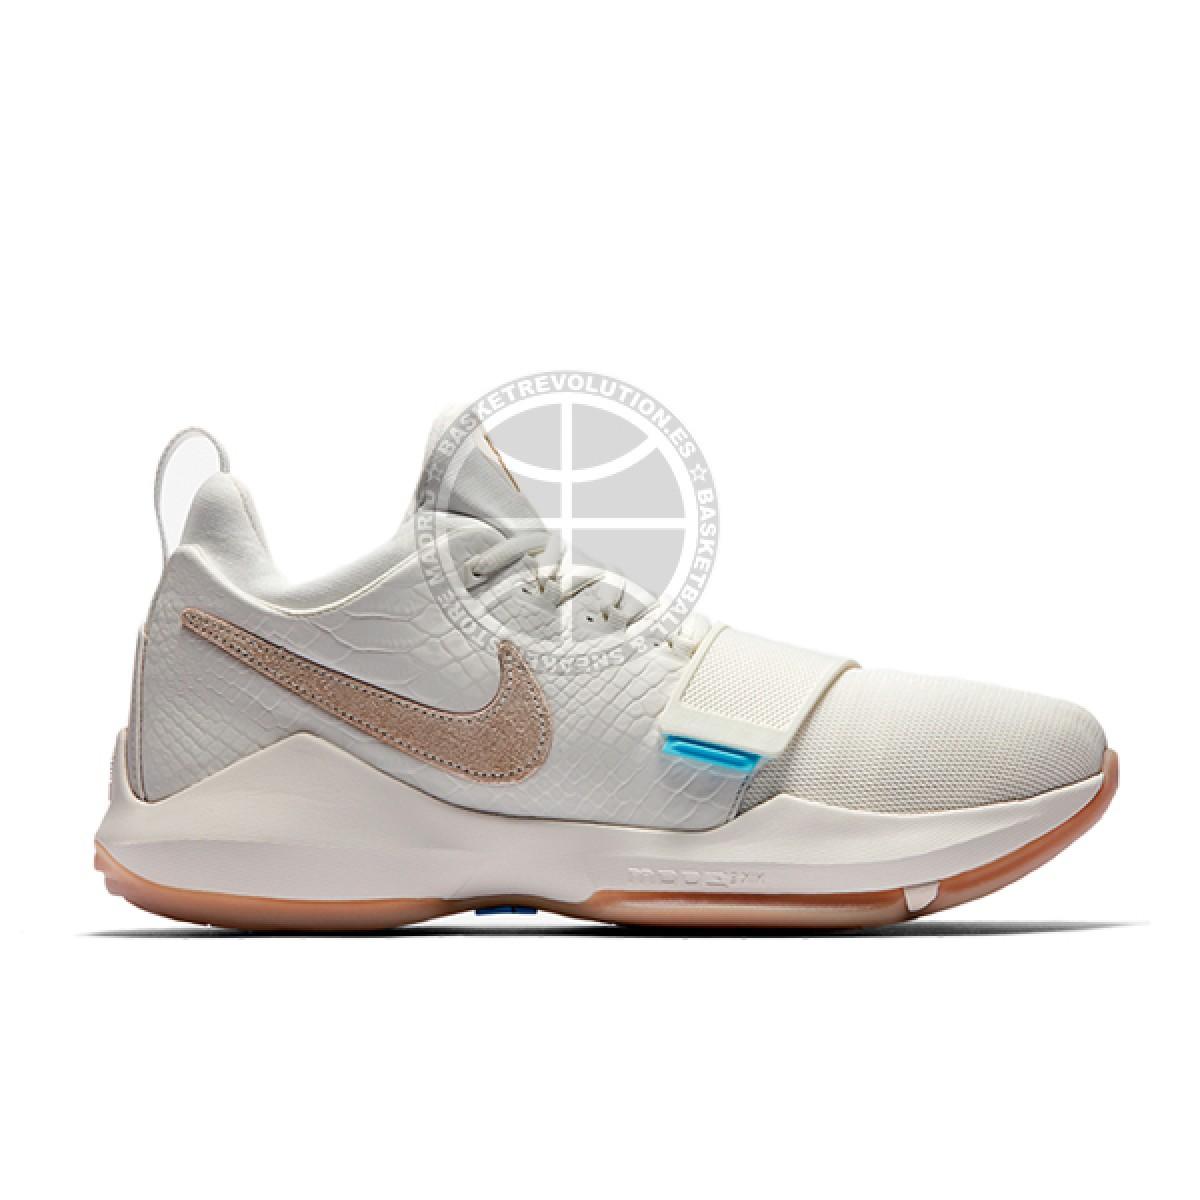 Nike PG 1 GS 'Ivory'  880304-110